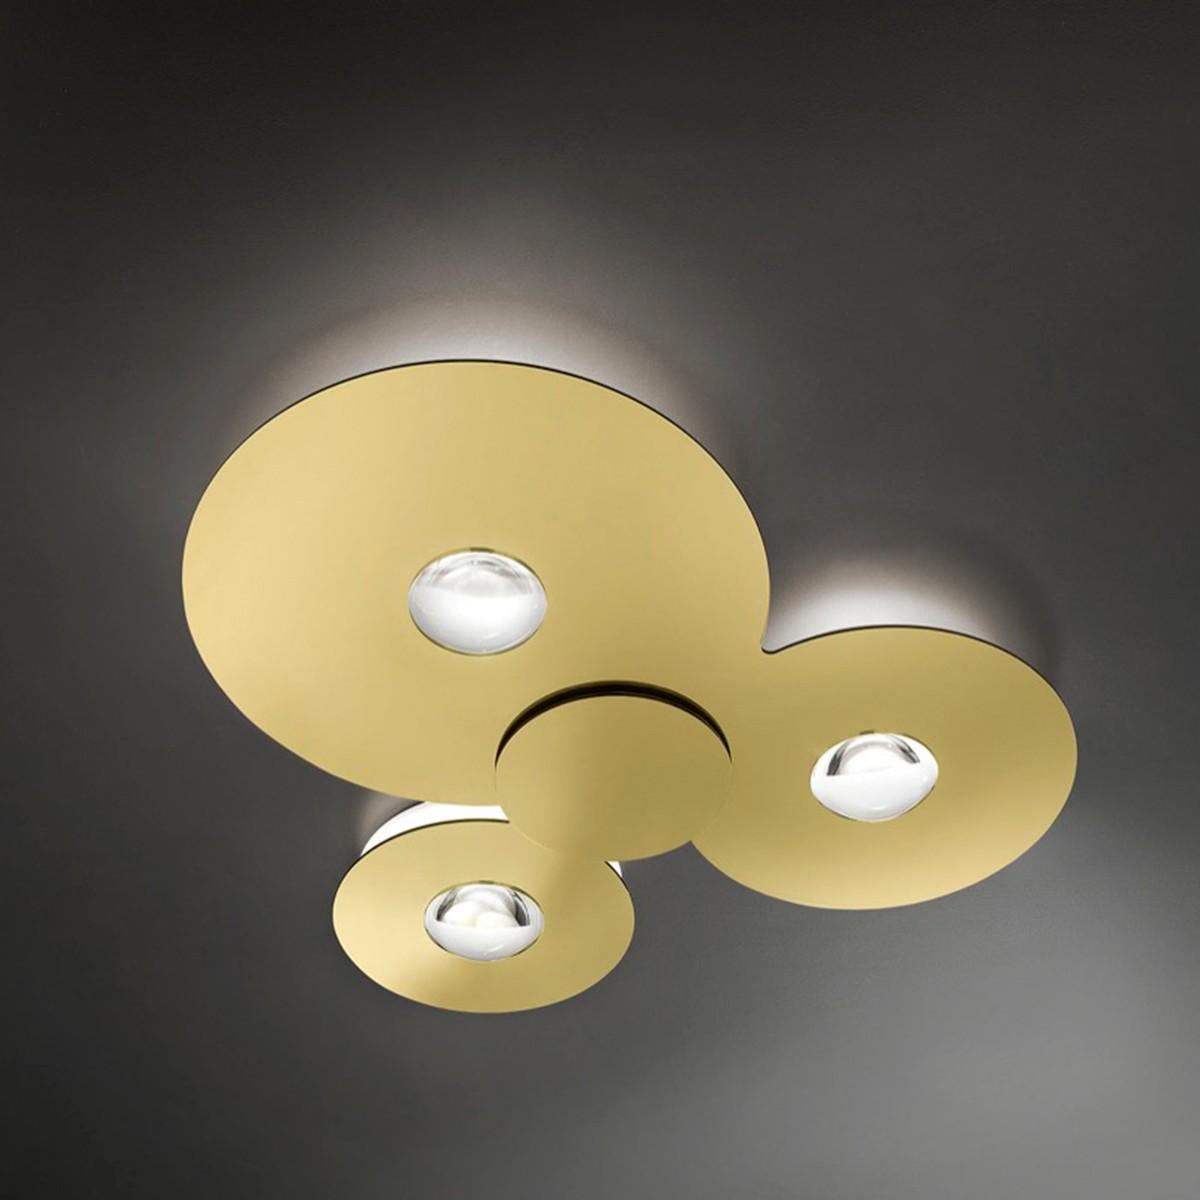 Studio Italia Design Bugia Triple Deckenleuchte, 2700 K, Gold